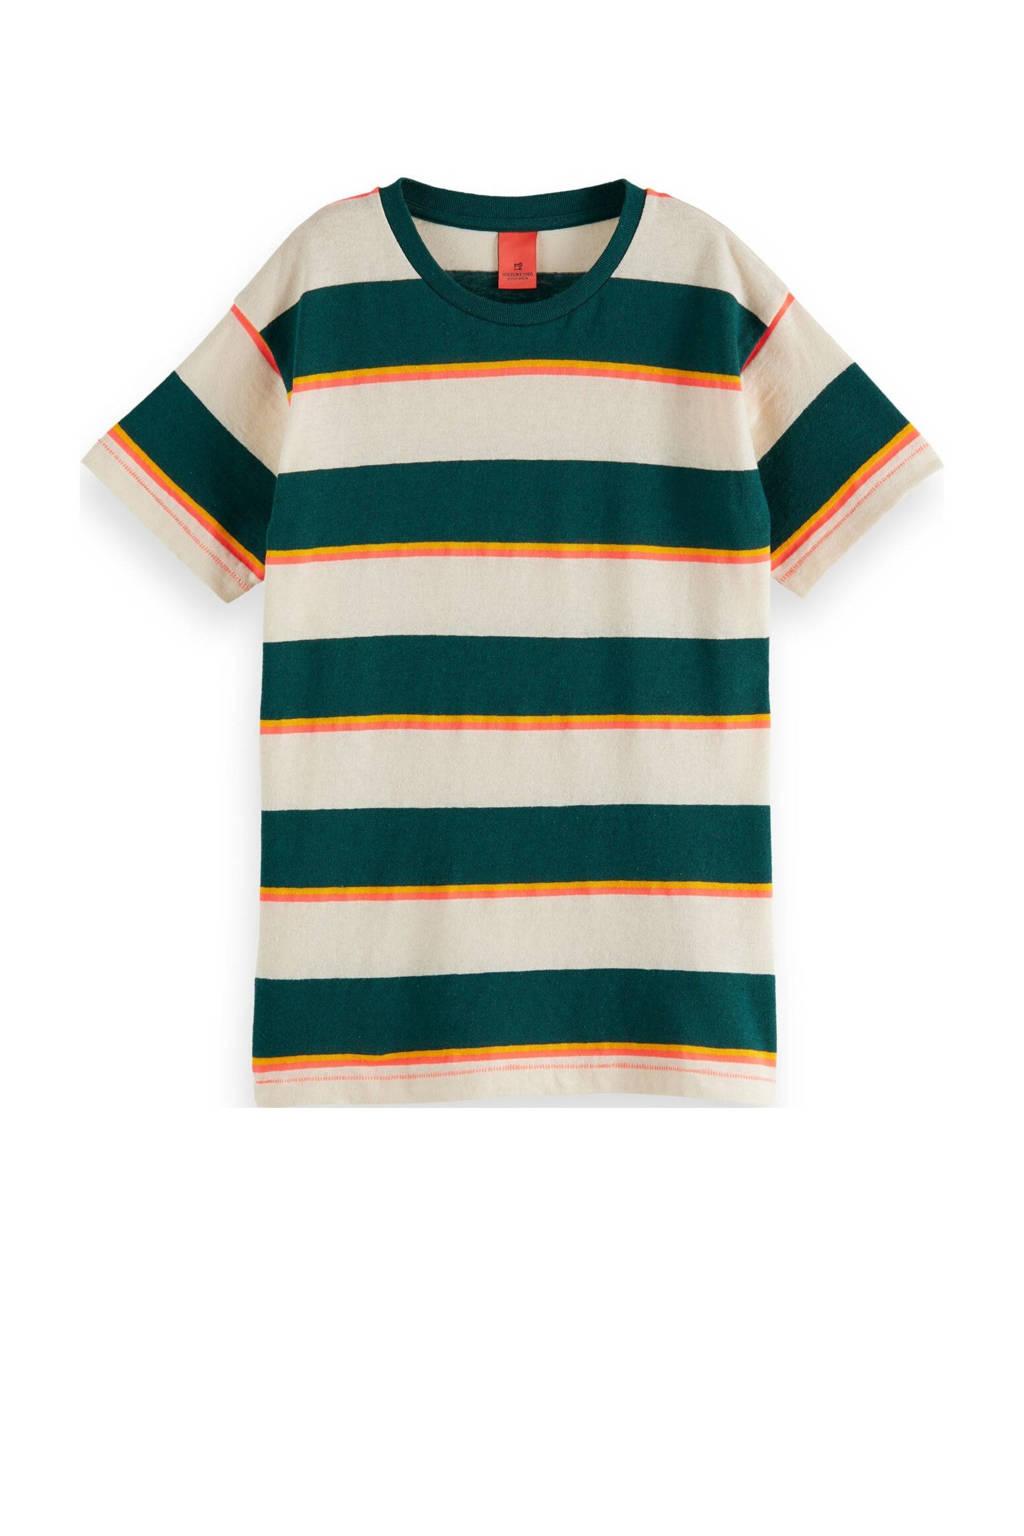 Scotch & Soda gestreept T-shirt groen/ecru/oranje, Groen/ecru/oranje